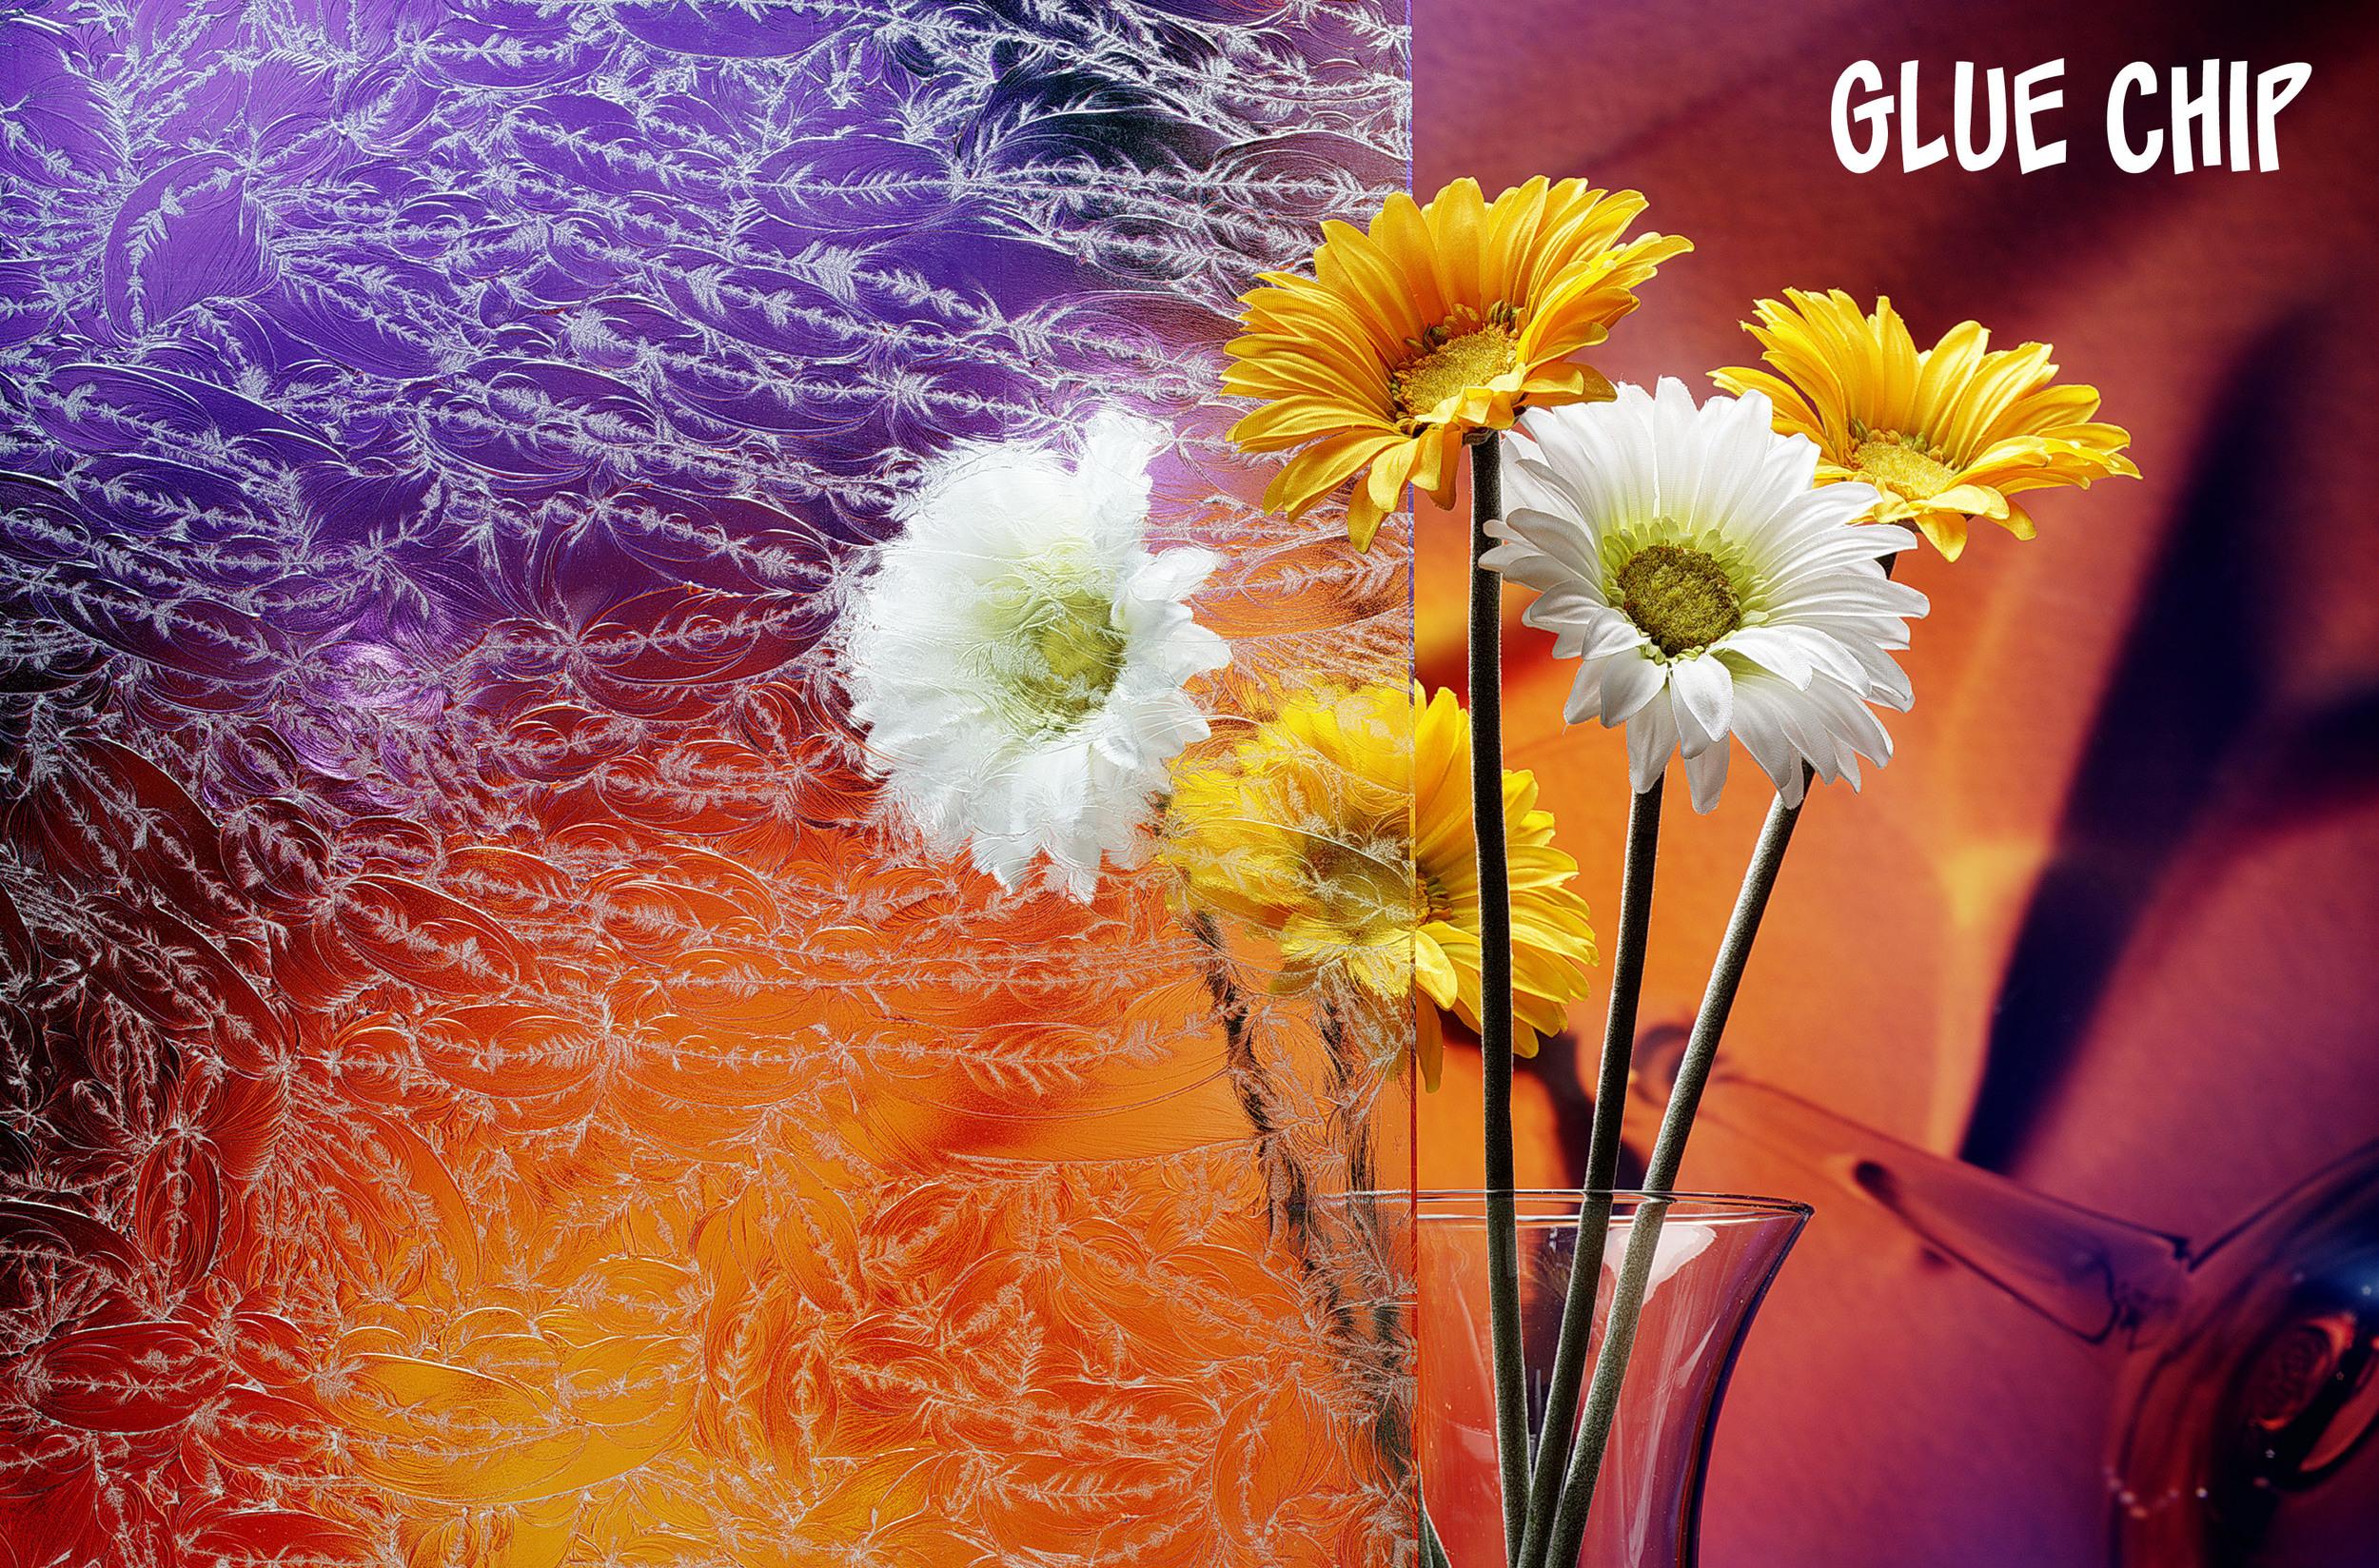 glue chip2.jpg